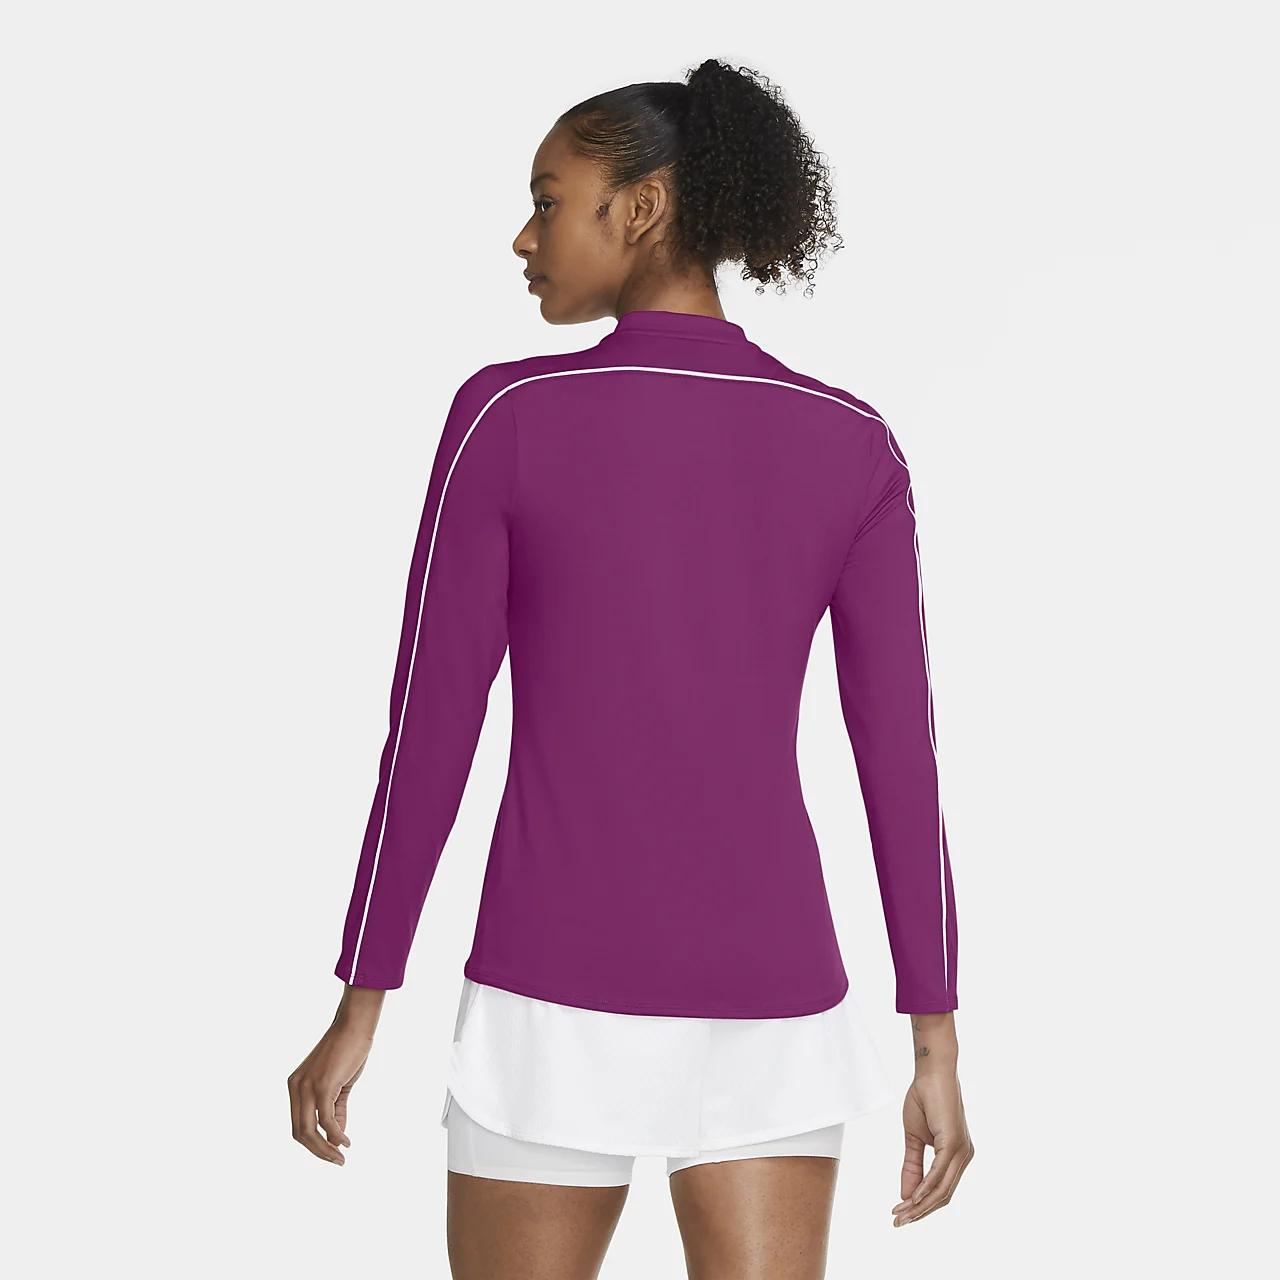 NikeCourt Dri-FIT Women's 1/2-Zip Long-Sleeve Tennis Top 939322-564